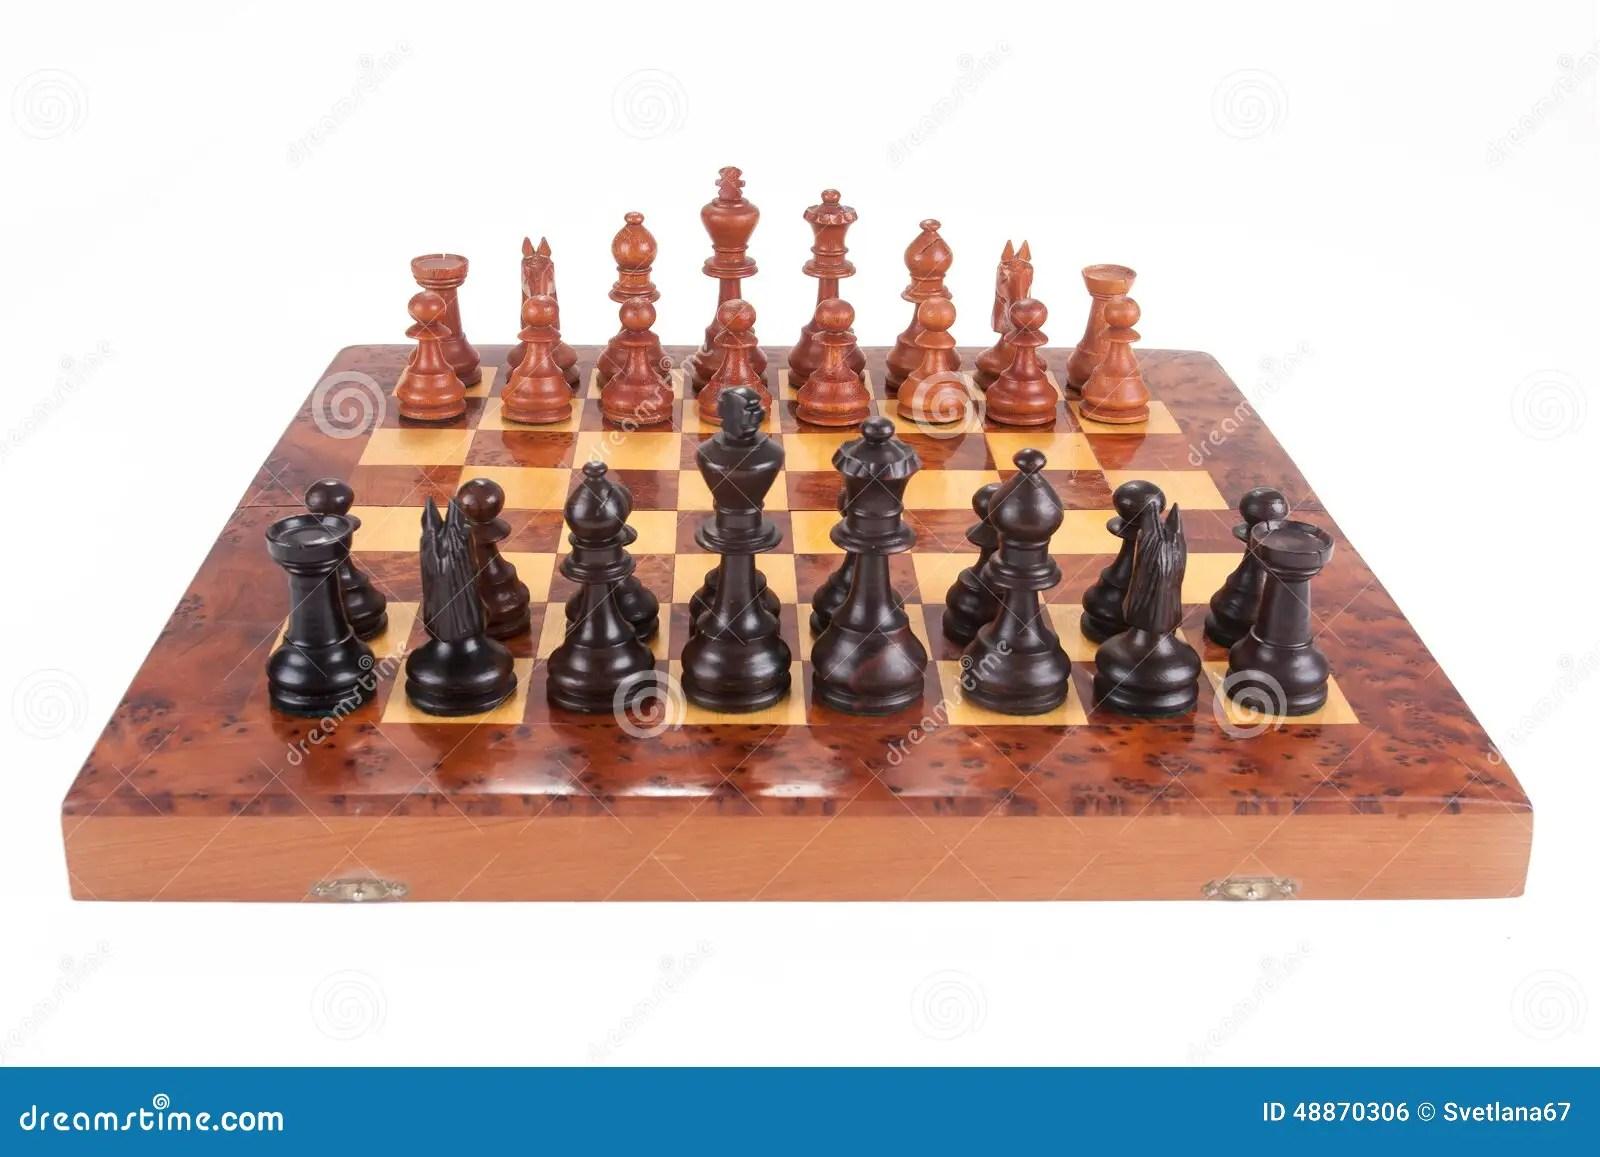 chess board setup diagram 2006 bmw 530i fuse bing images